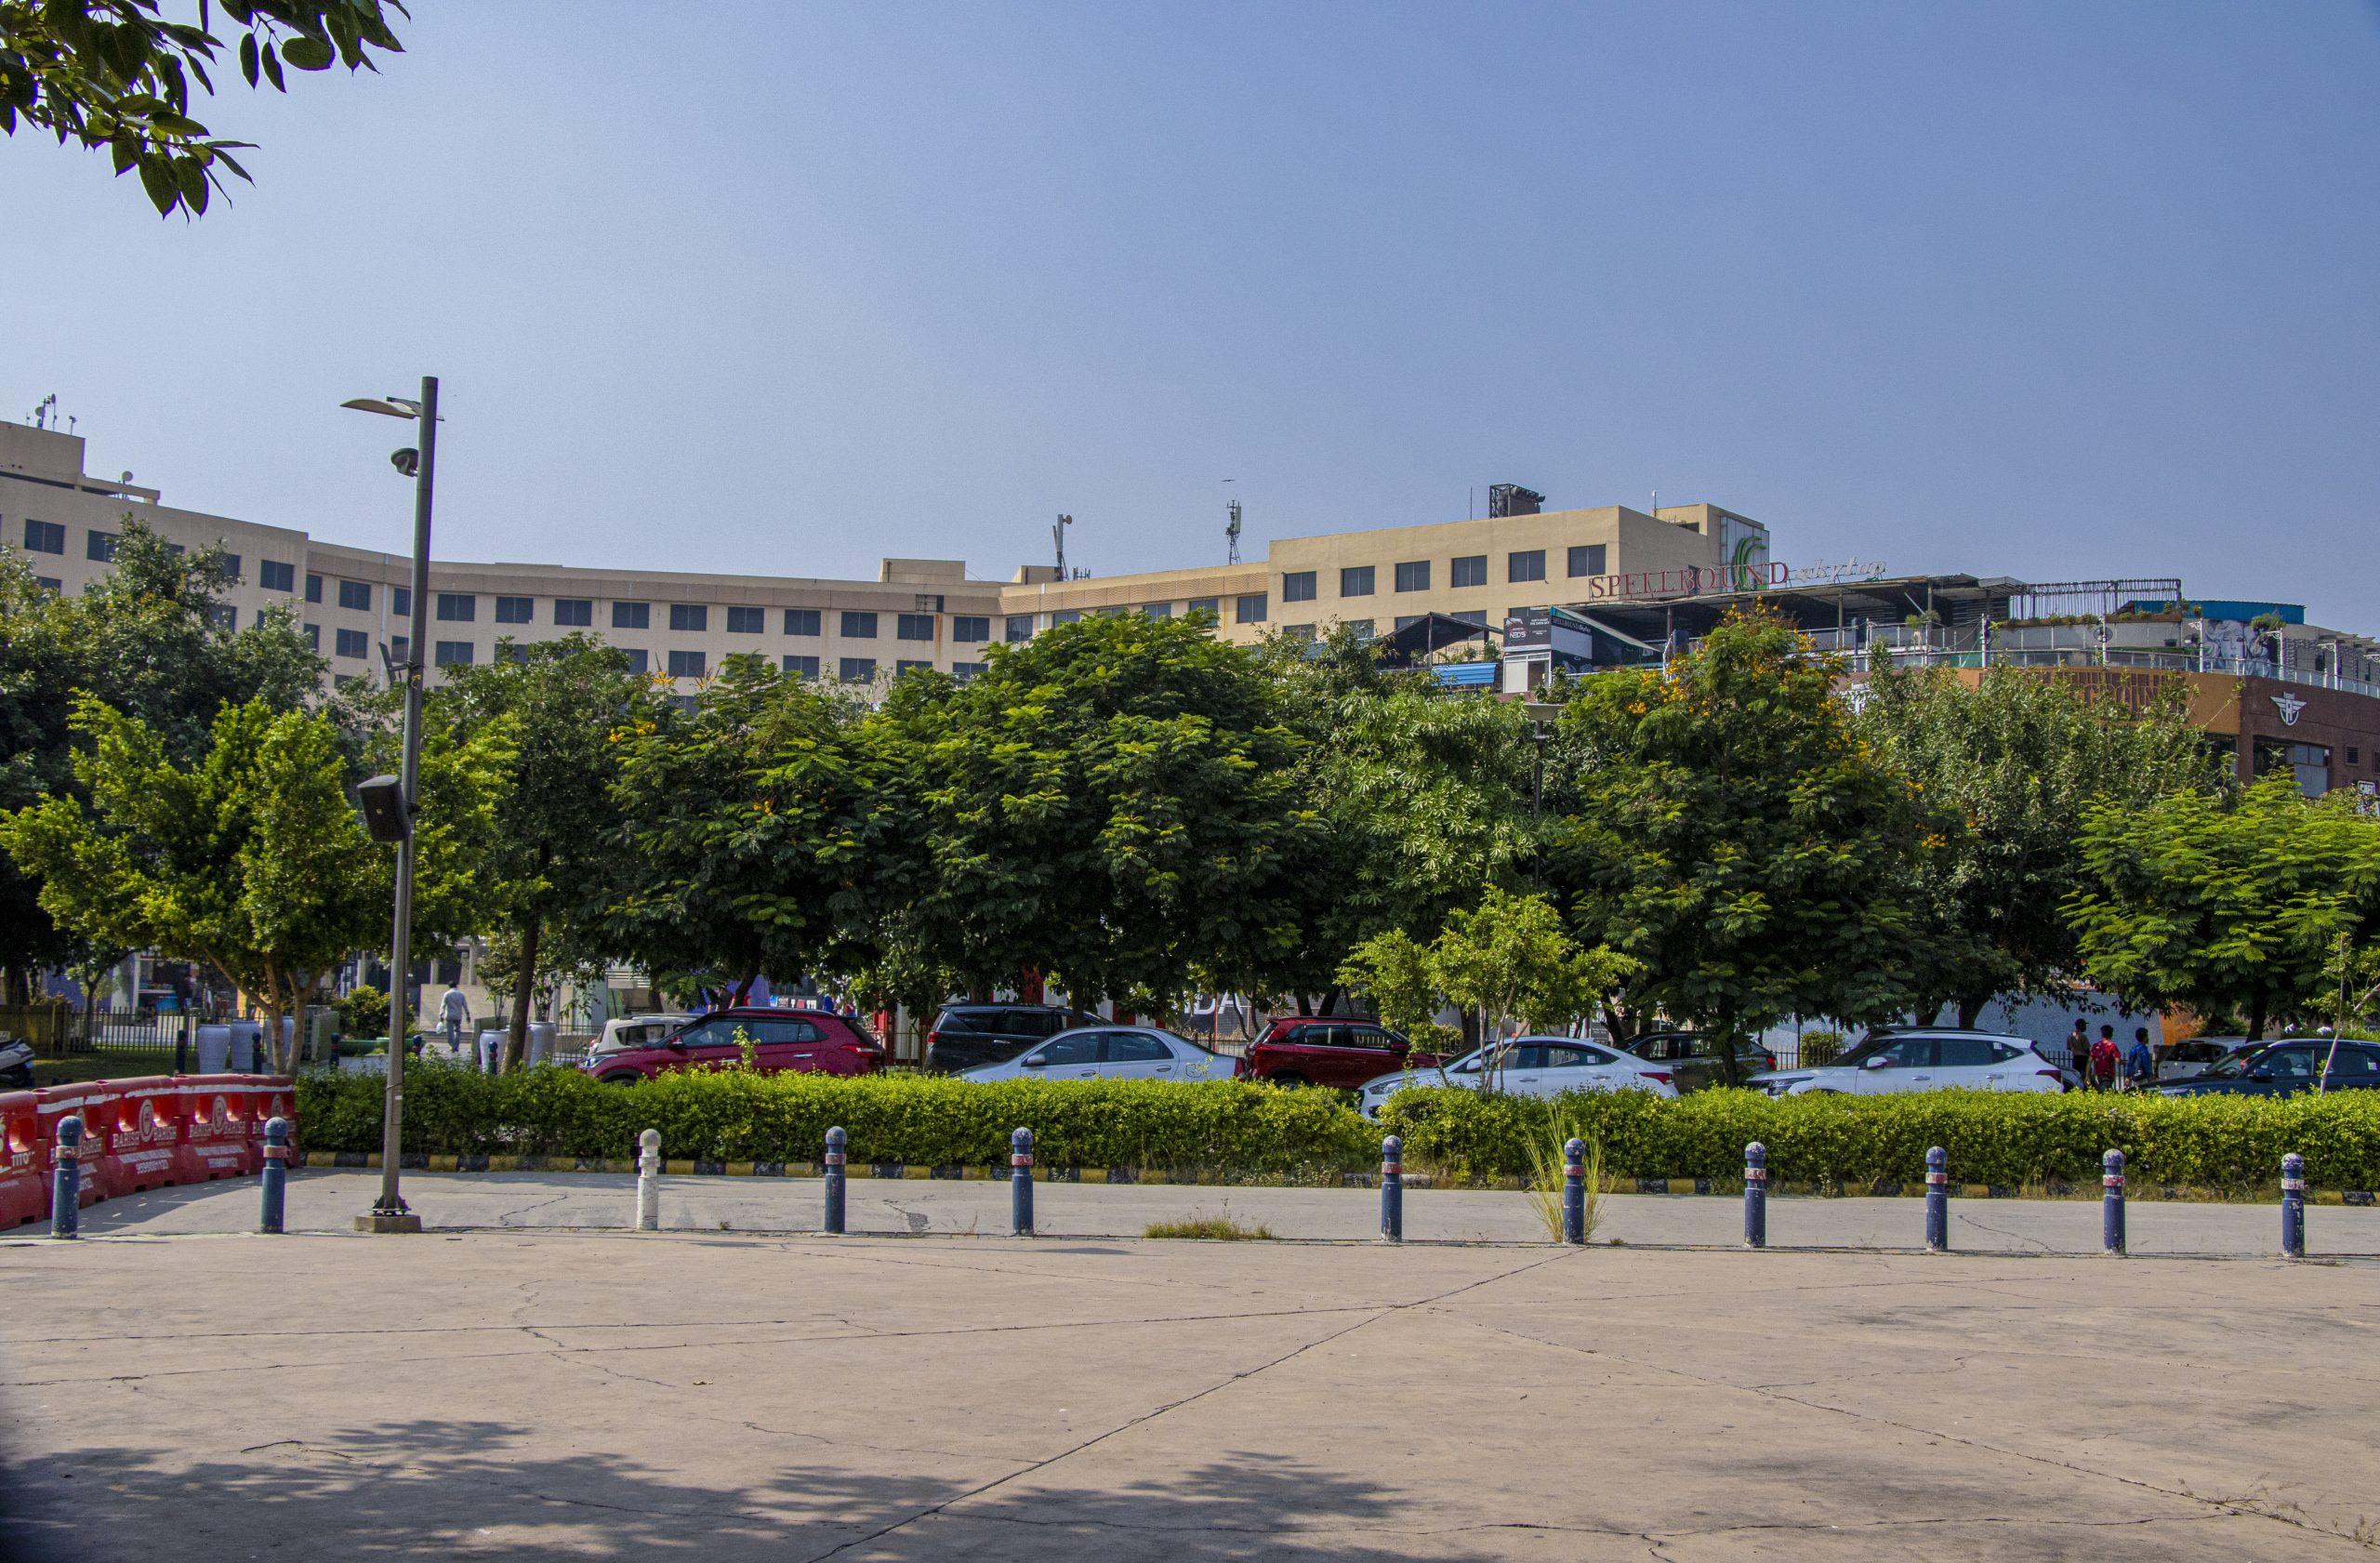 Garden Galleria Mall in Noida